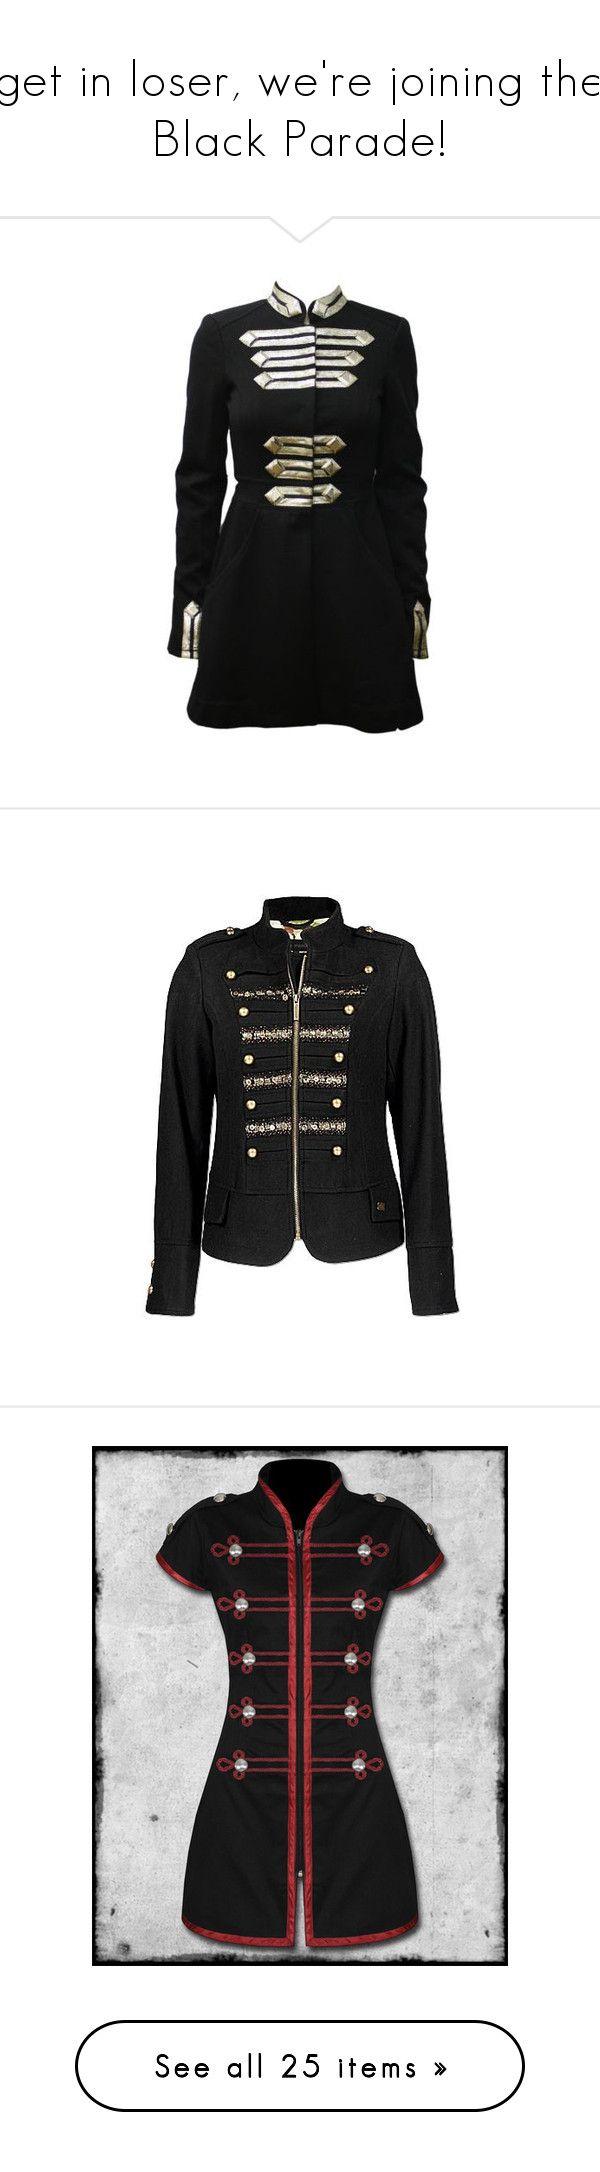 Jawbreaker black parade military jacket